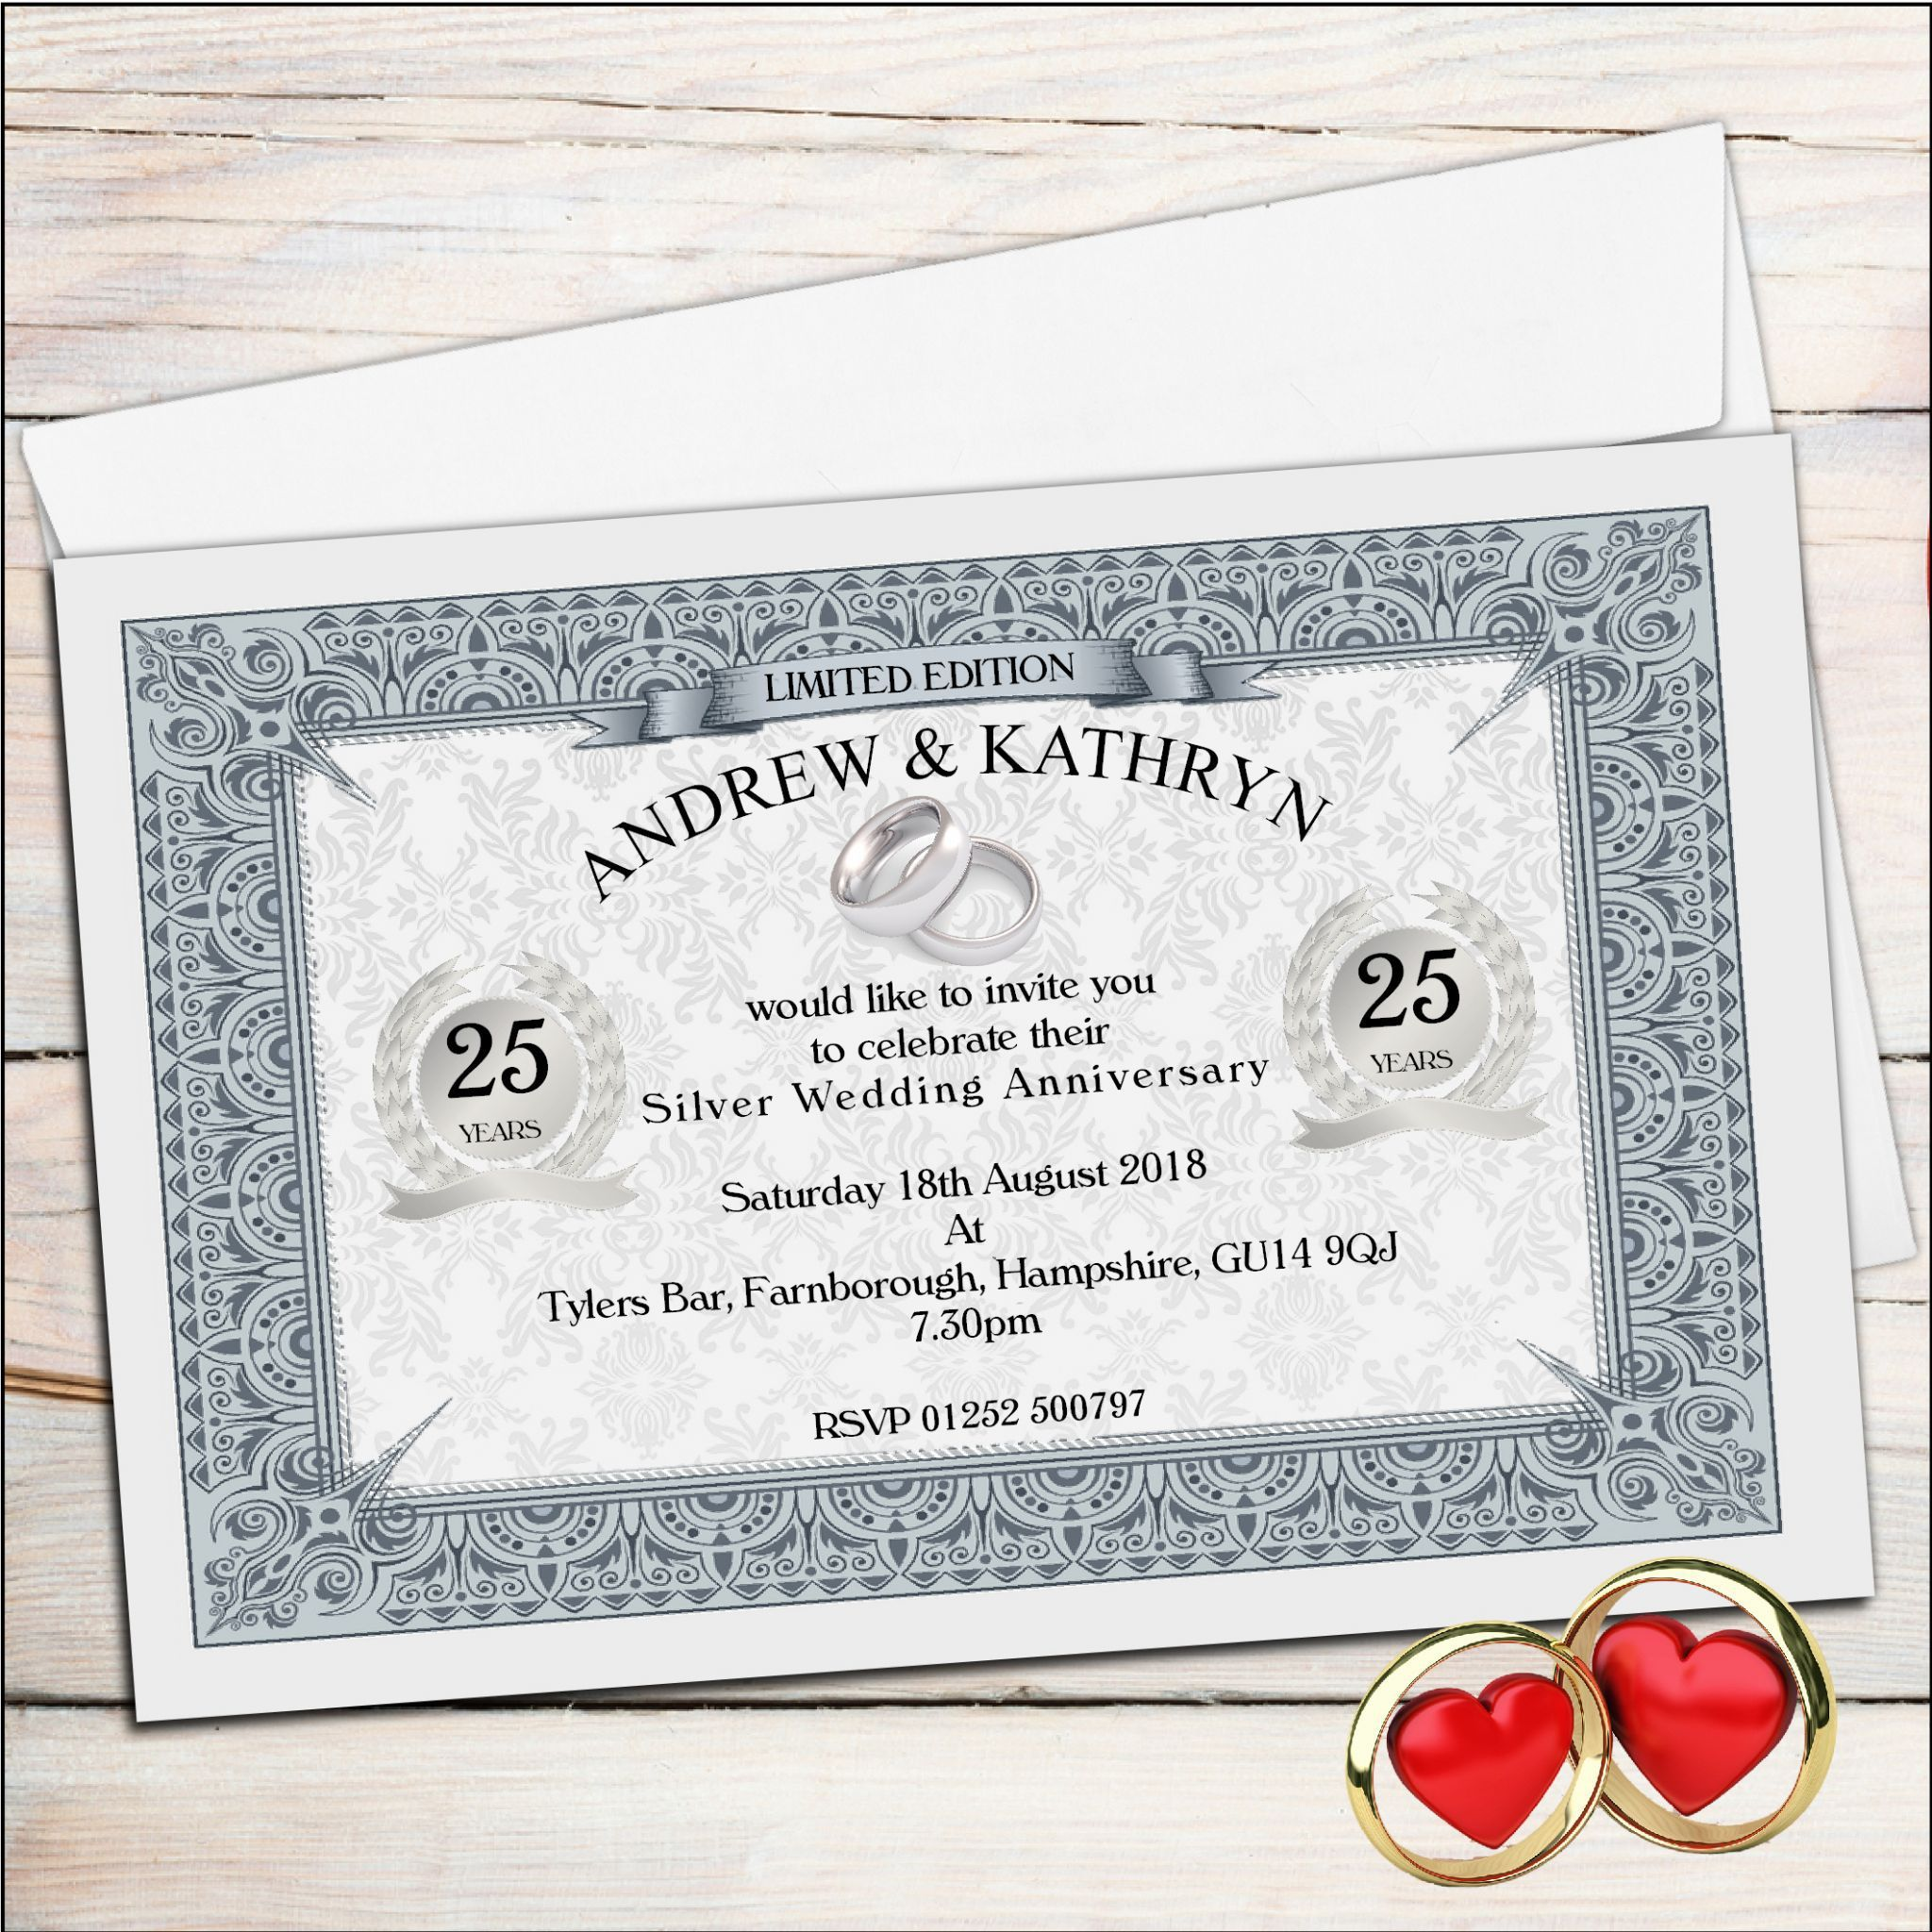 25th silver wedding anniversary invitations   wedding invitations ...